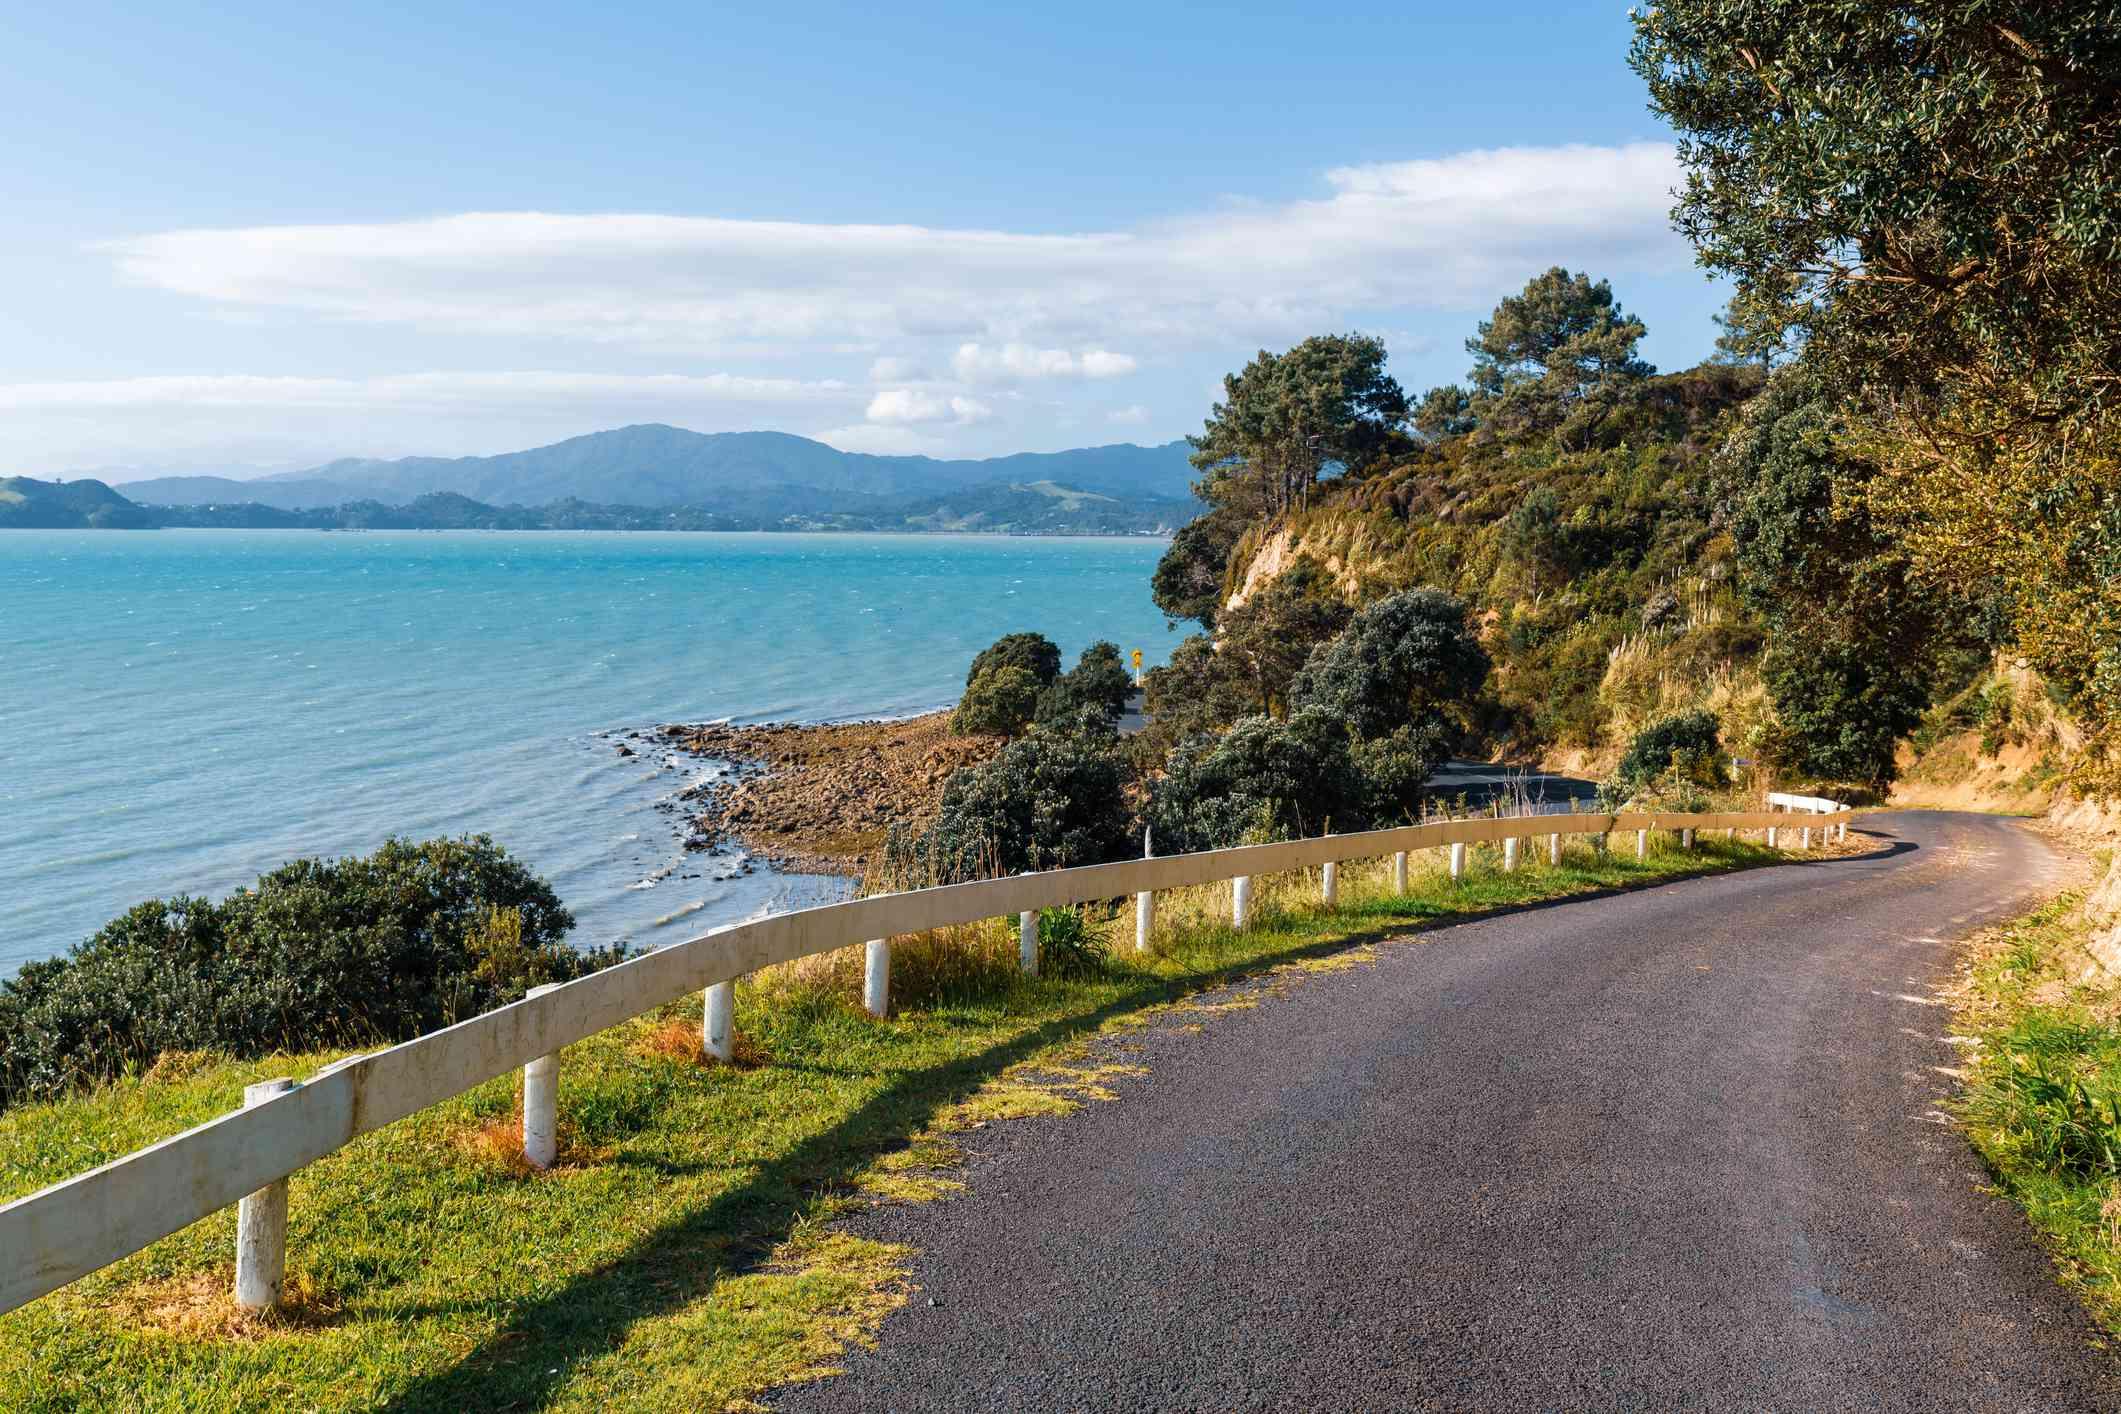 narrow coastal road with trees and blue sea beyond